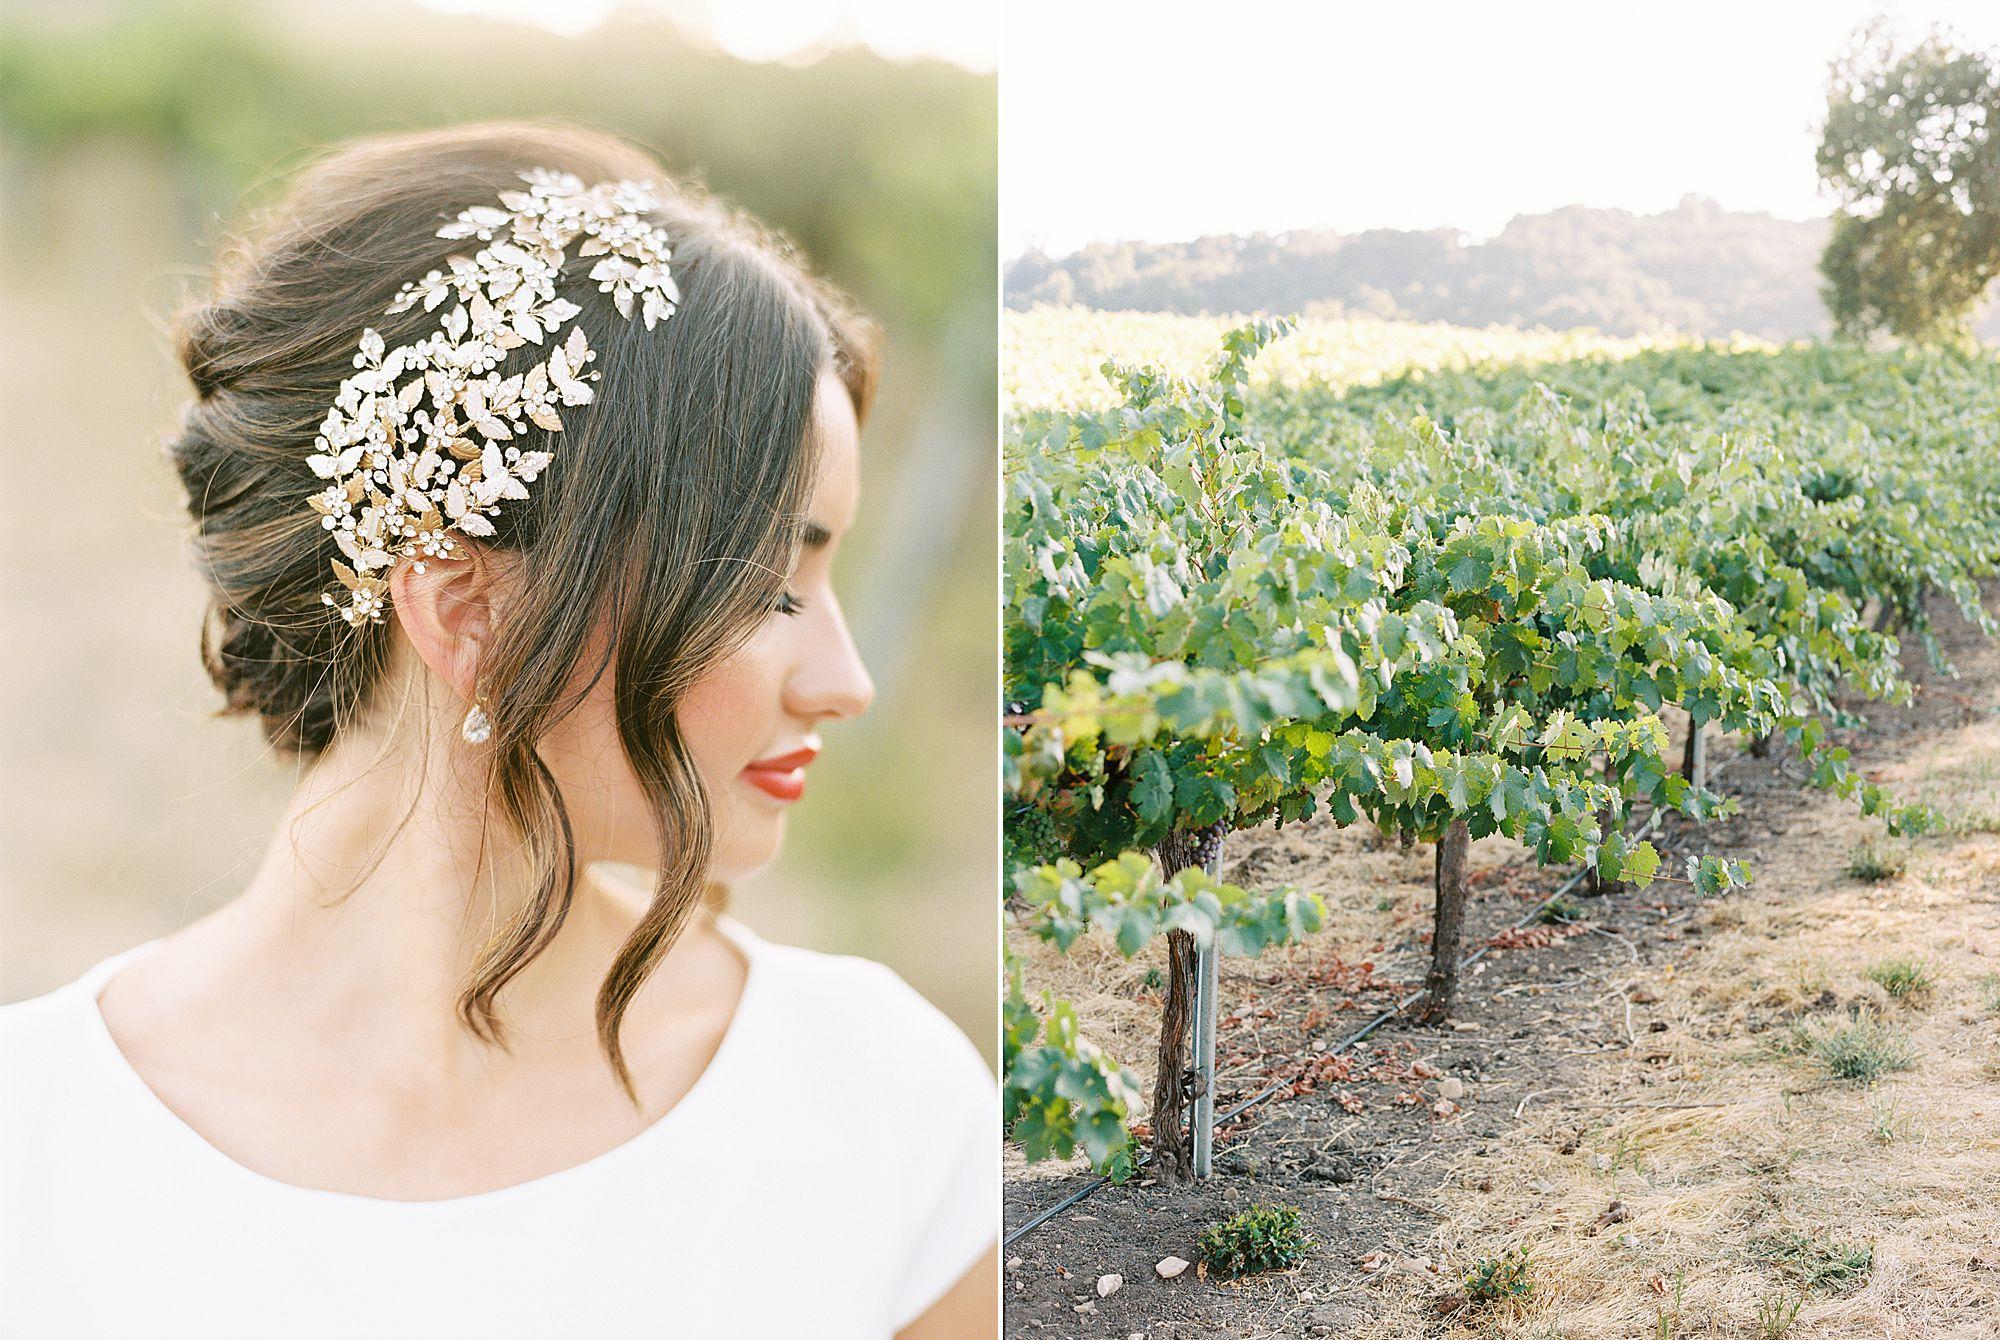 HammerSky Wedding Inspiration Featured on Hey Wedding Lady with Vanessa Noel Events - Ashley Baumgartner - SLO Wedding Photographer_0029.jpg